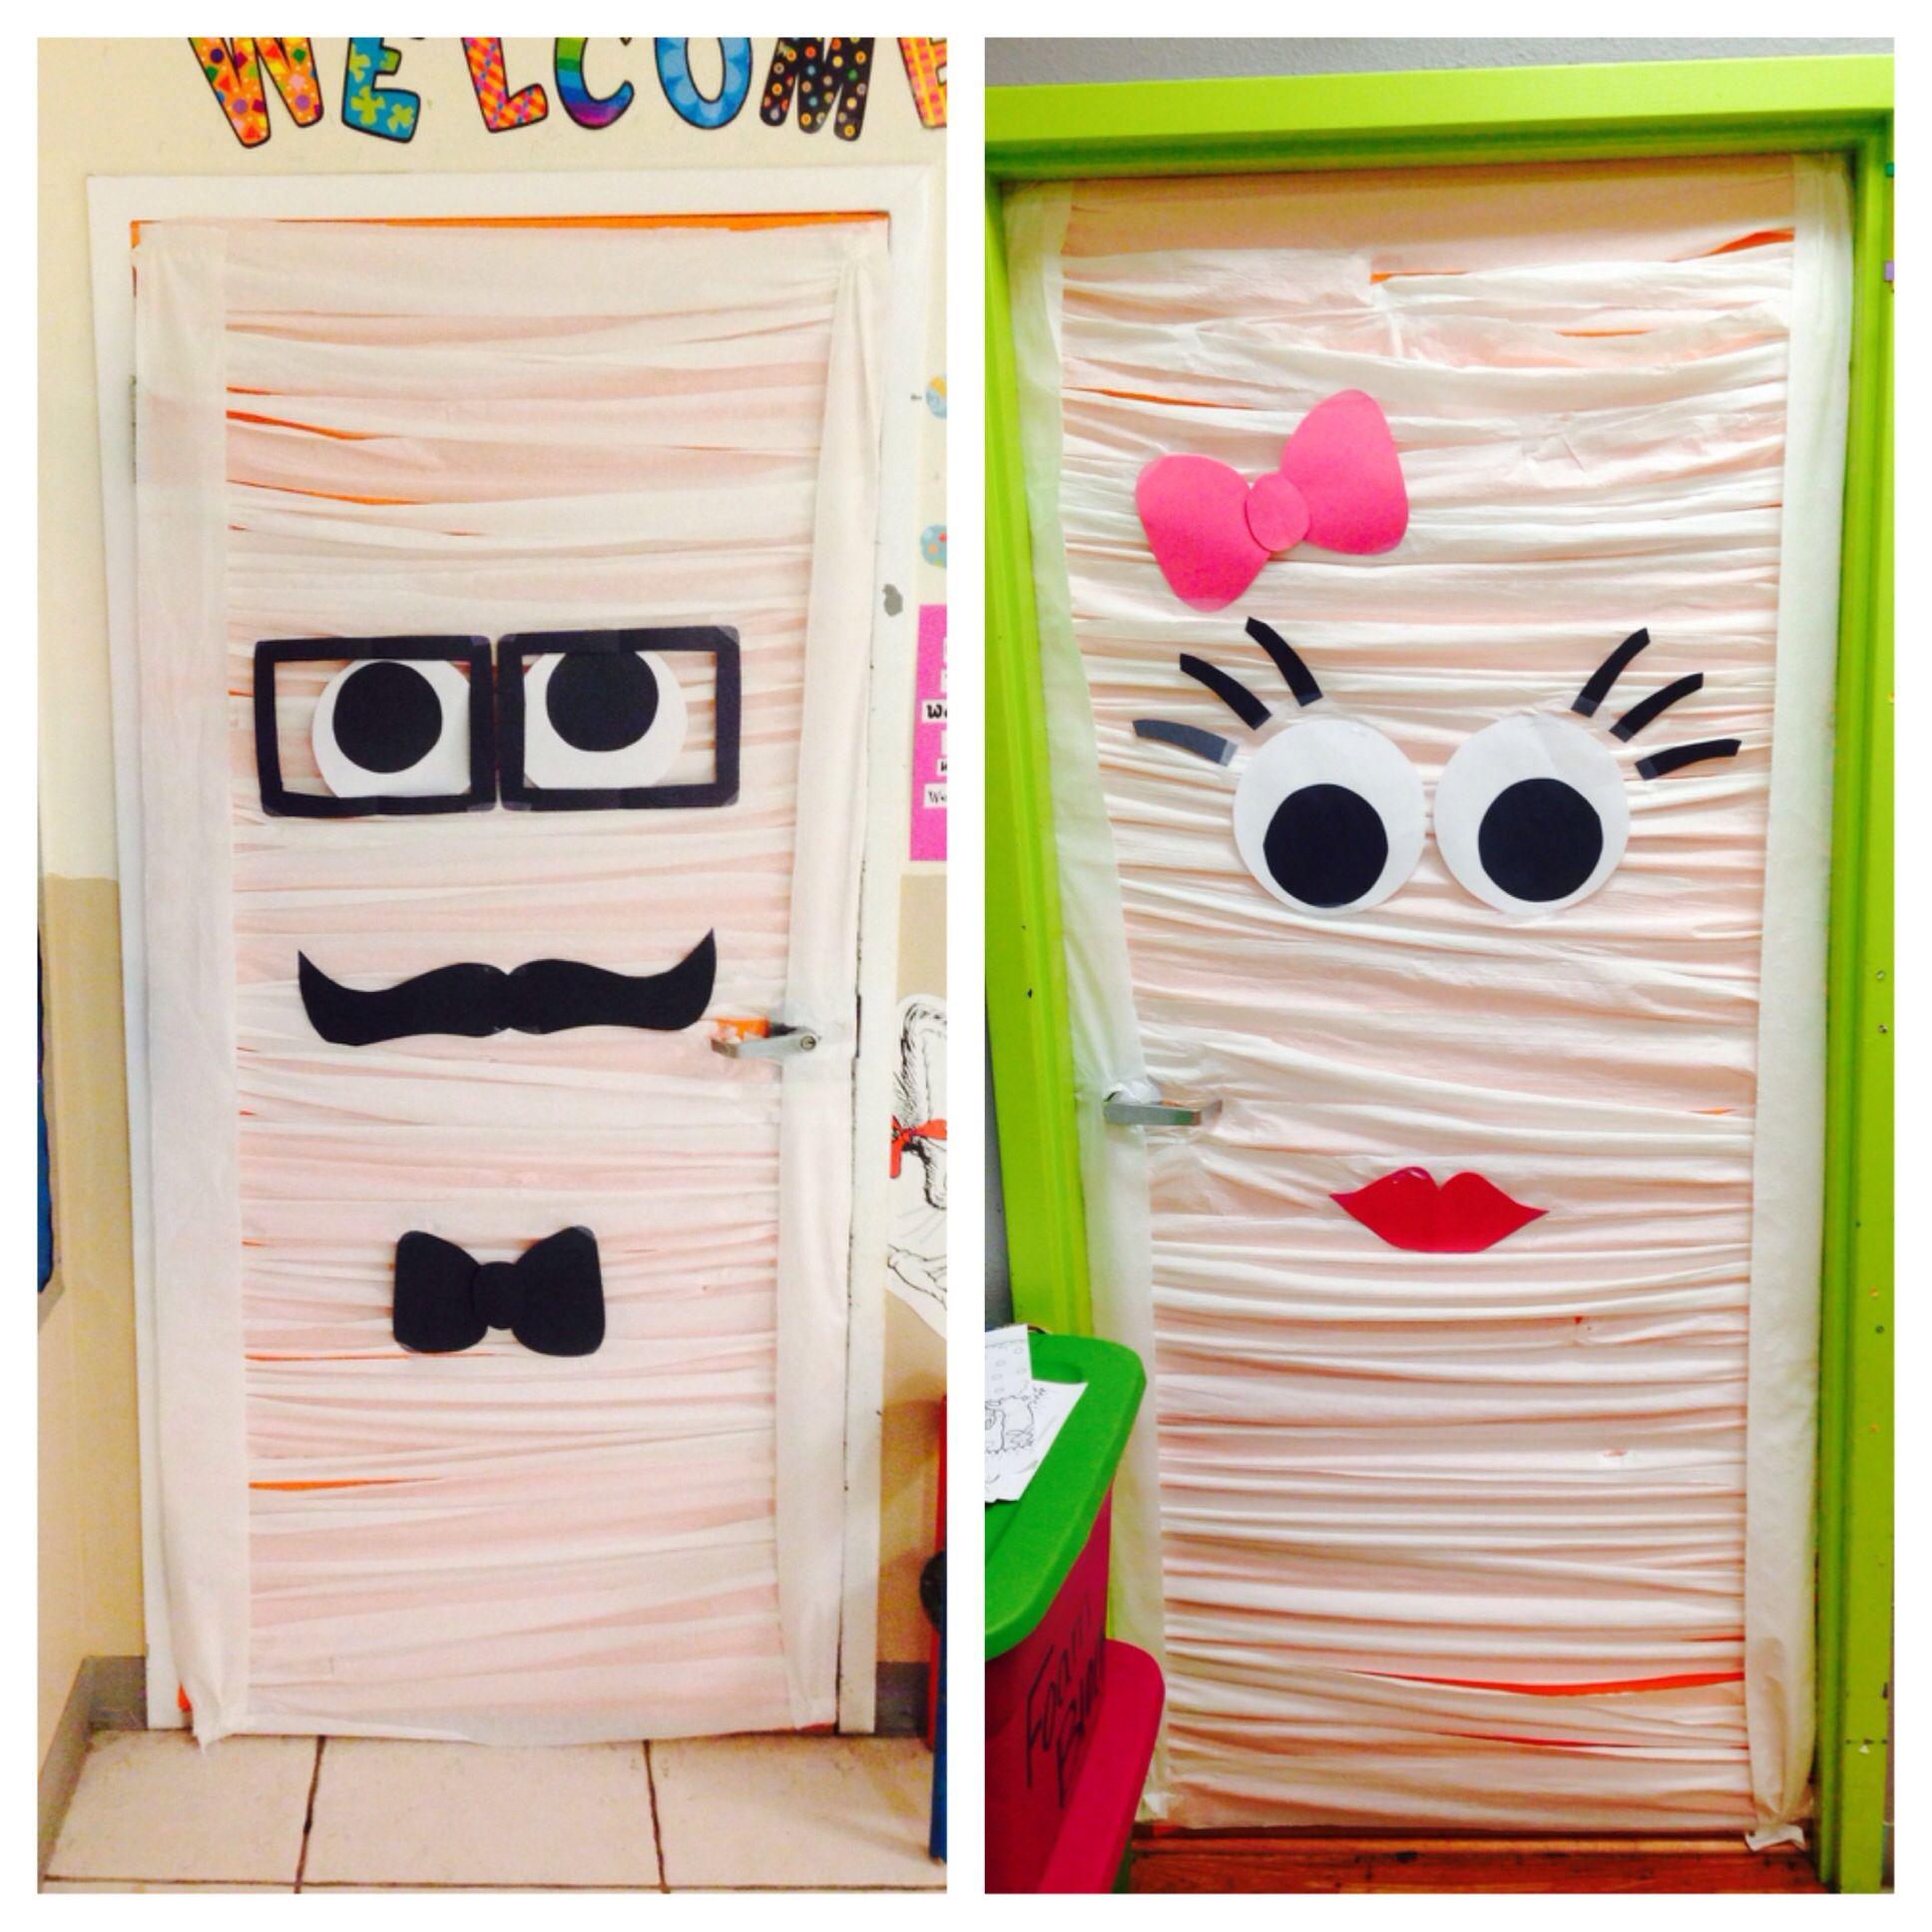 Our Double Sided Halloween Mummy Door Decoration Now Let S See How Long It Lasts School Door Decorations Halloween Door Decorations Halloween Party Decor Diy